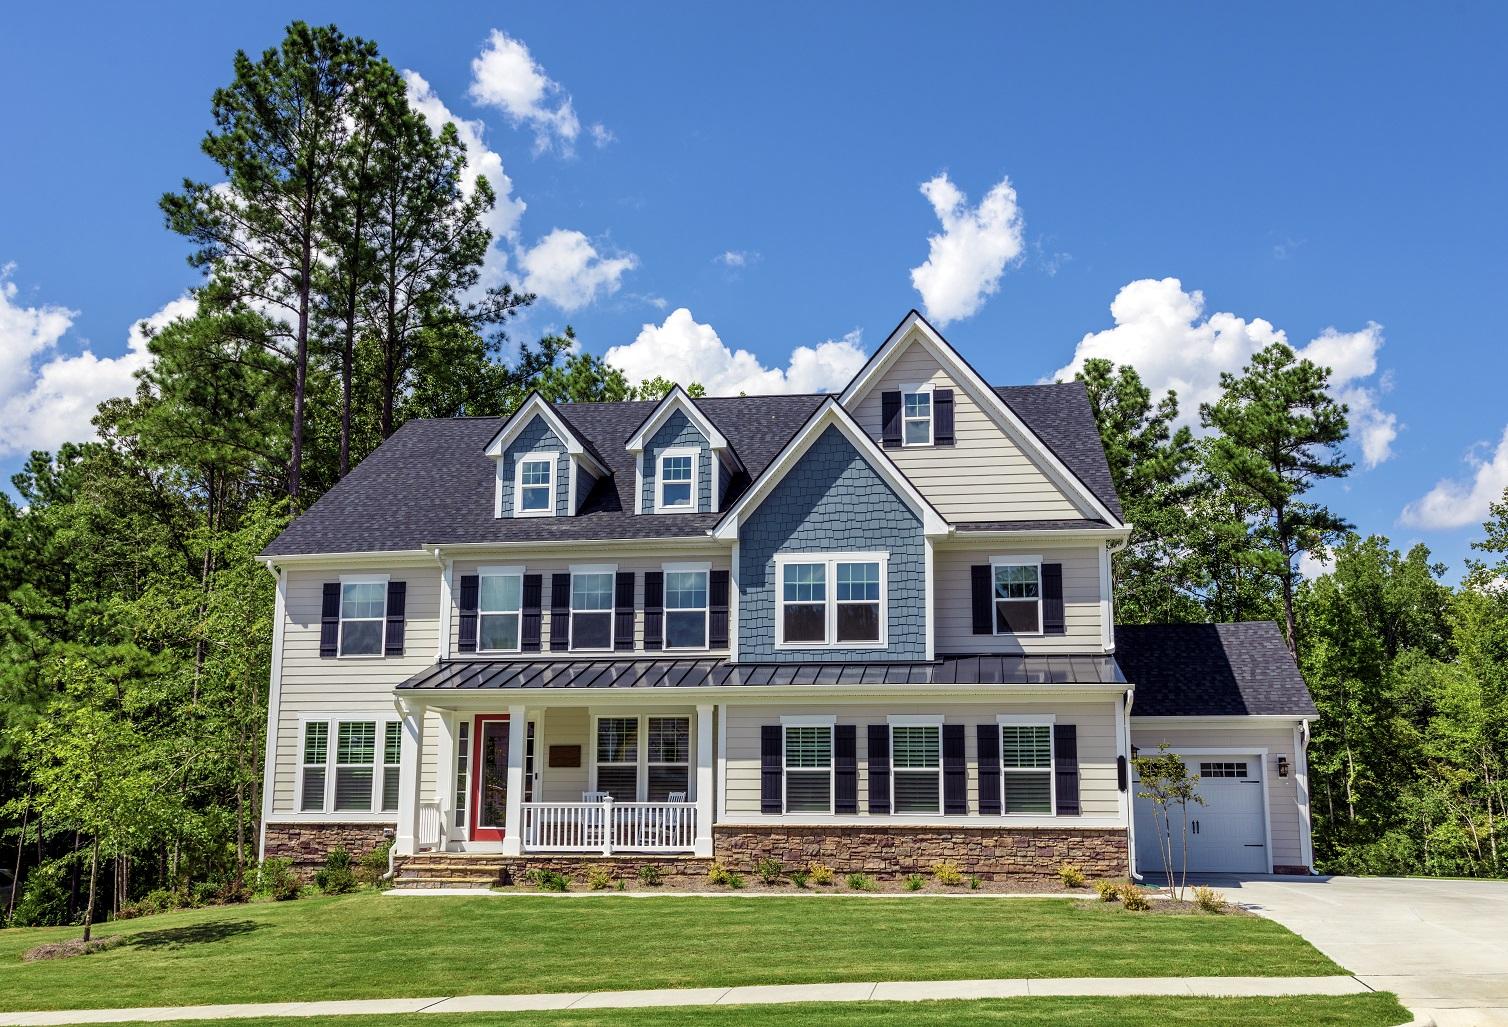 Beautiful newly built house